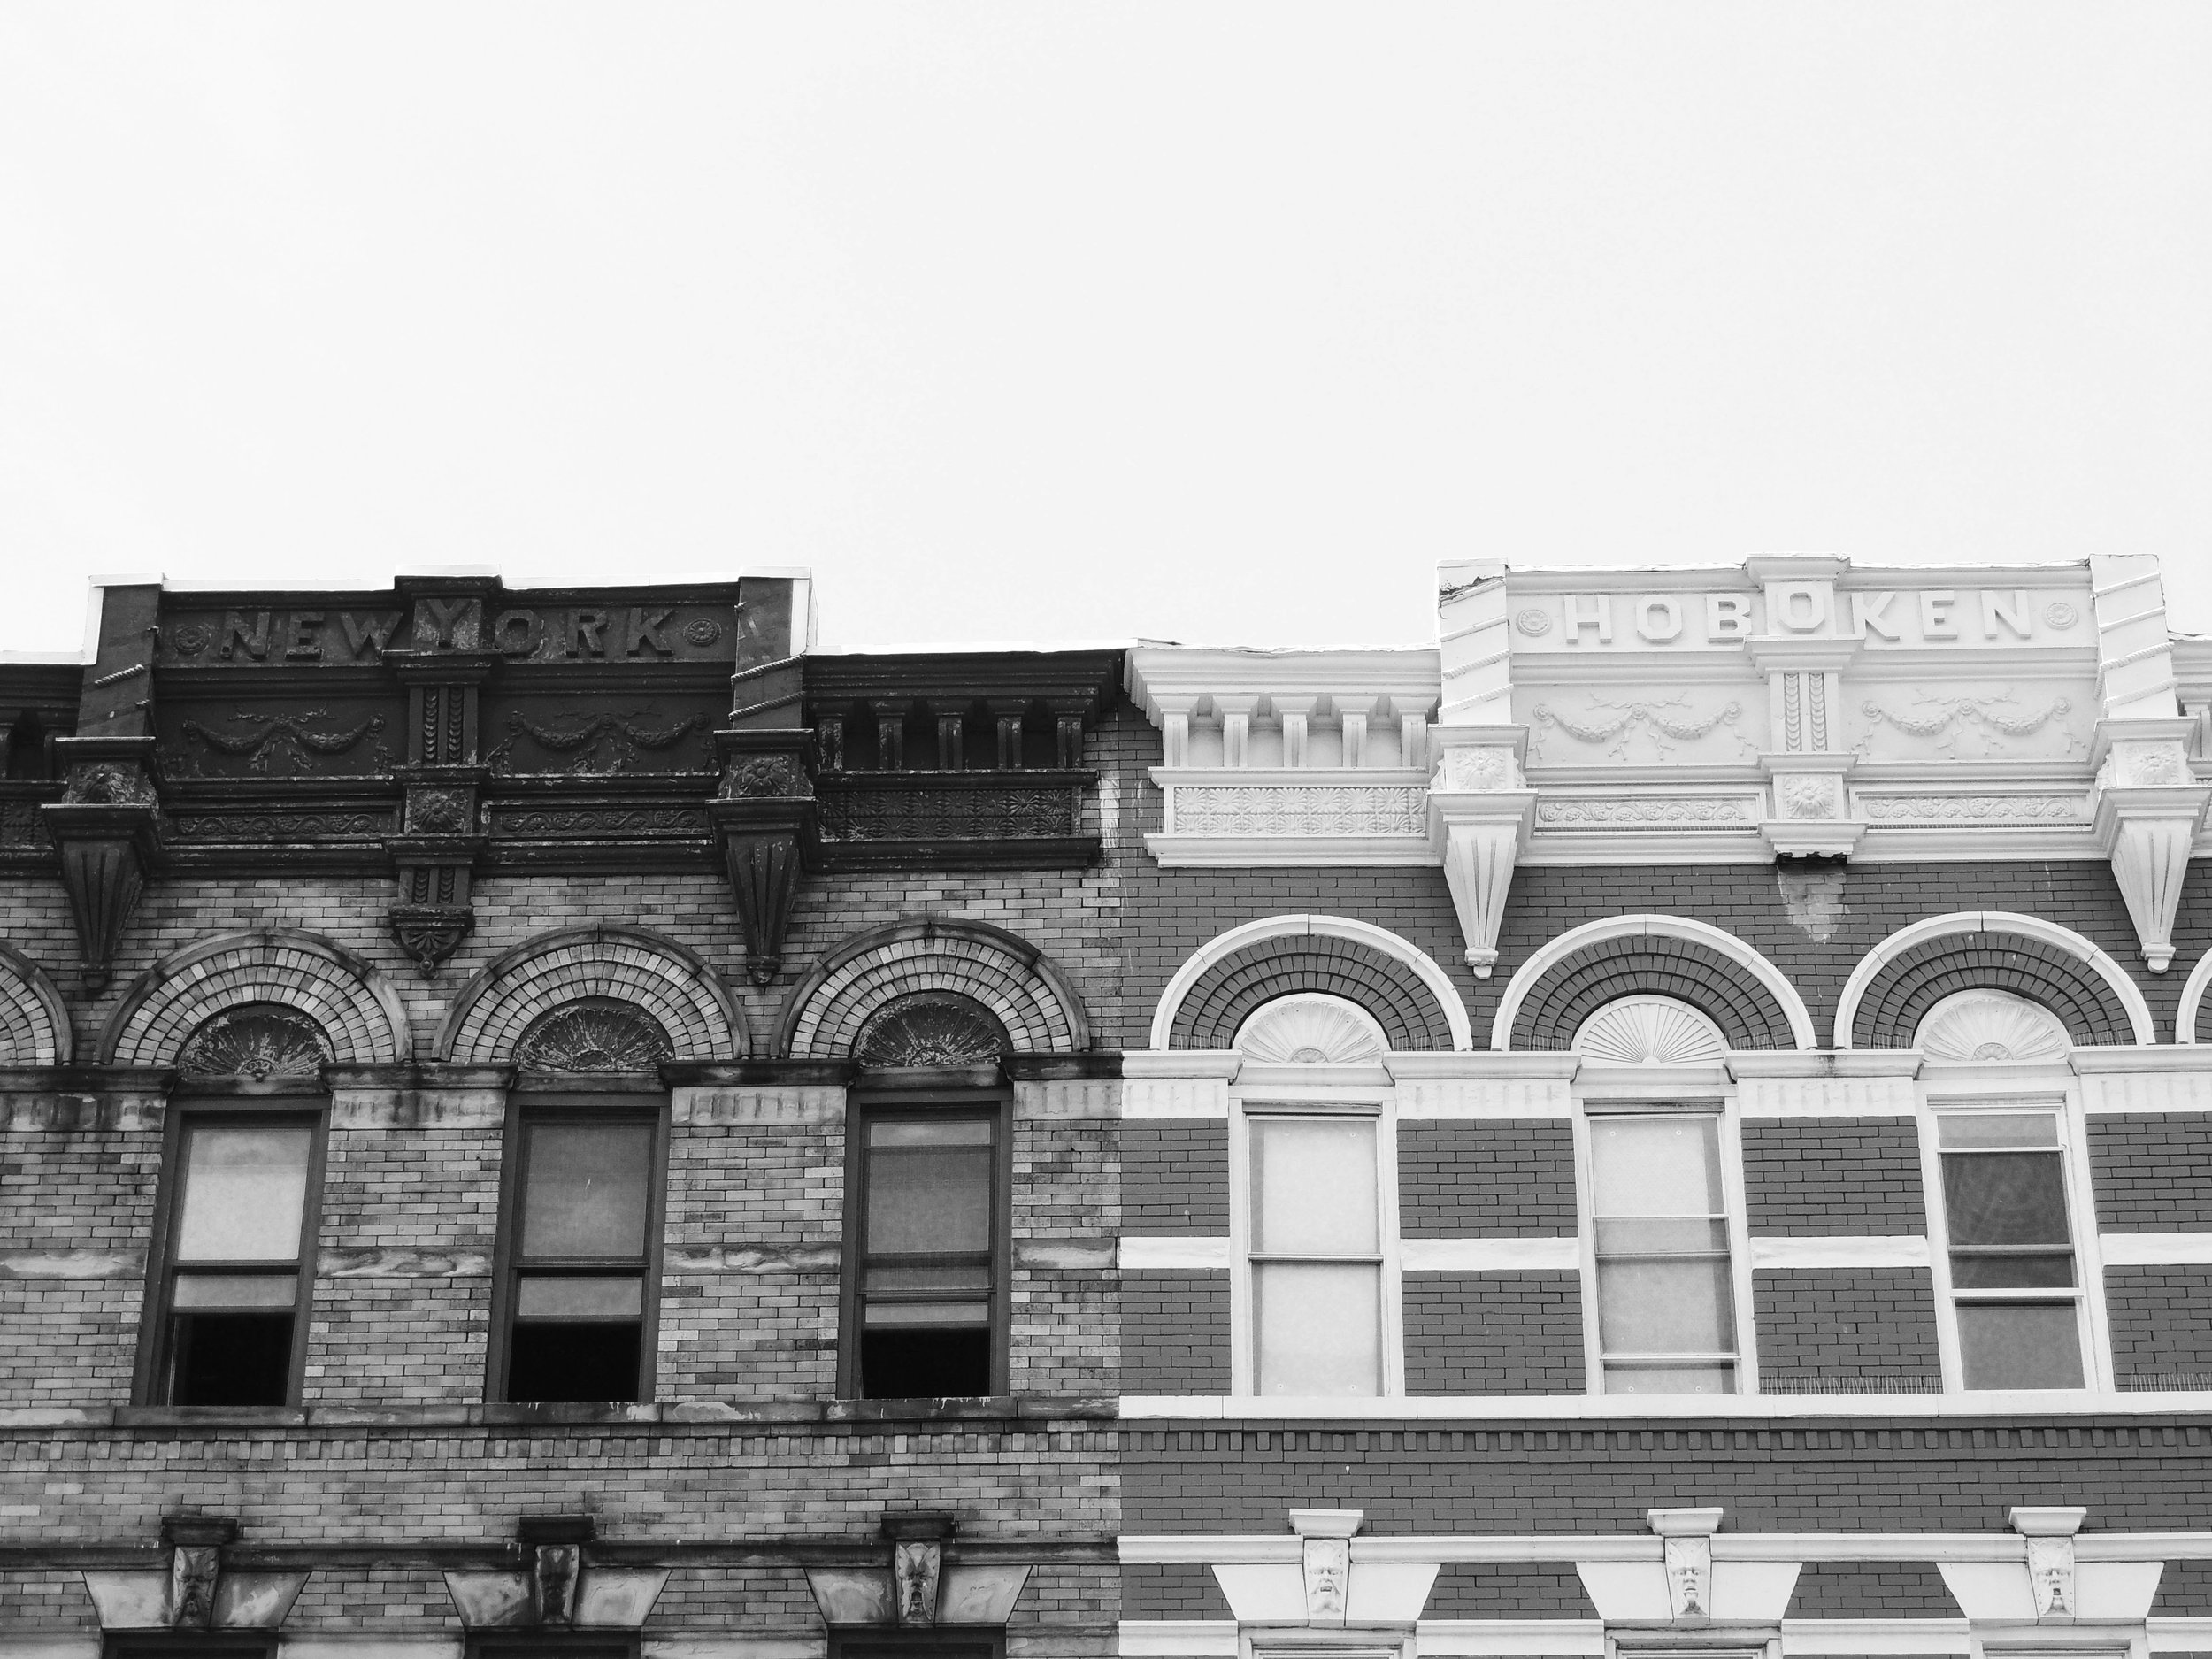 Hoboken Building Photography